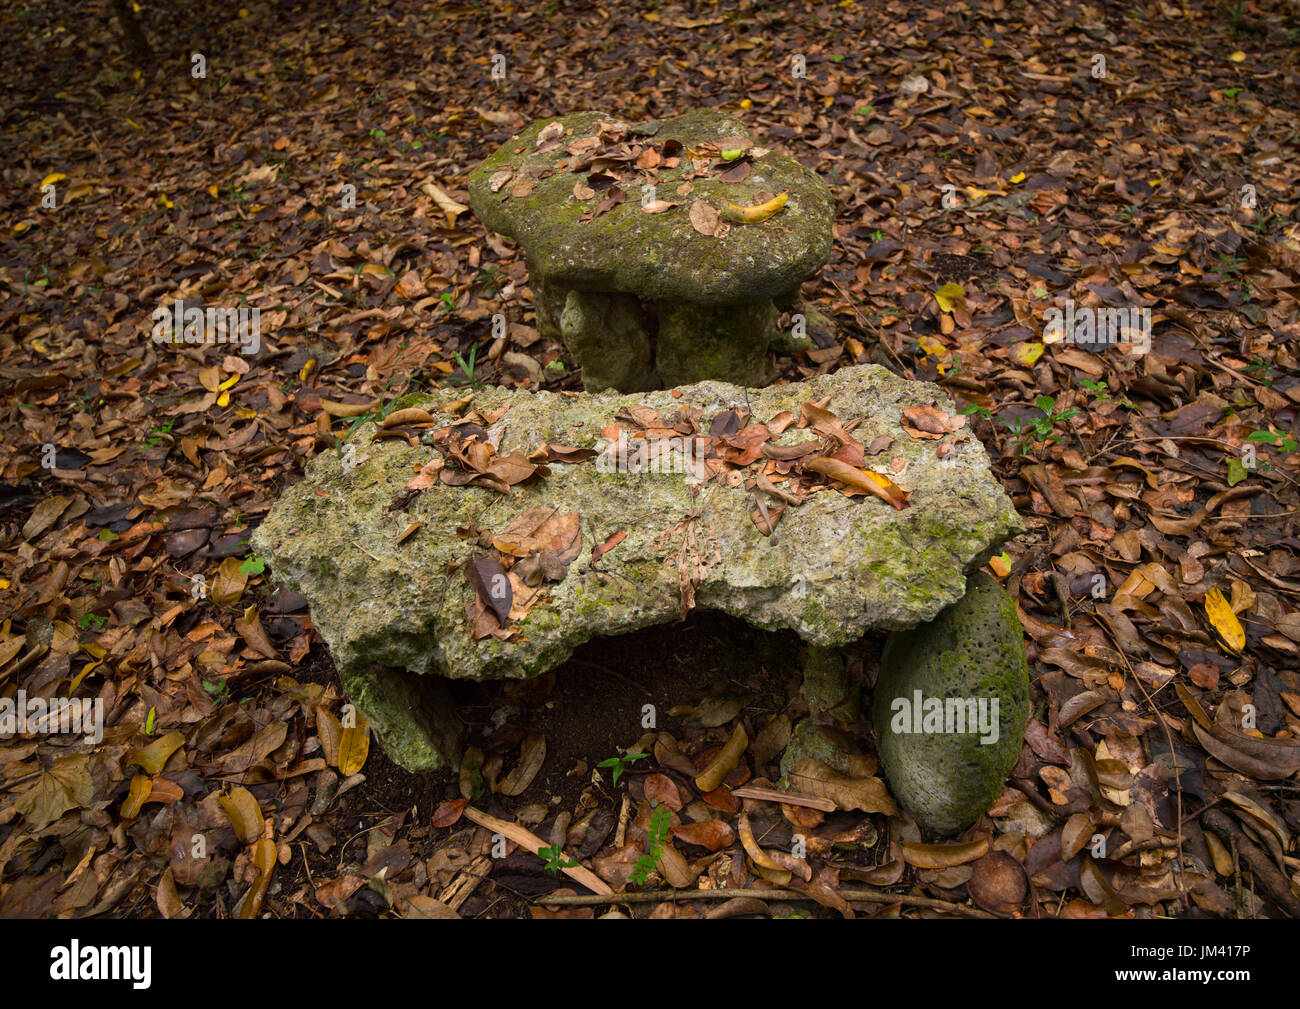 Sacrifice table in Amelbati cannibal site, Malampa Province, Malekula Island, Vanuatu - Stock Image